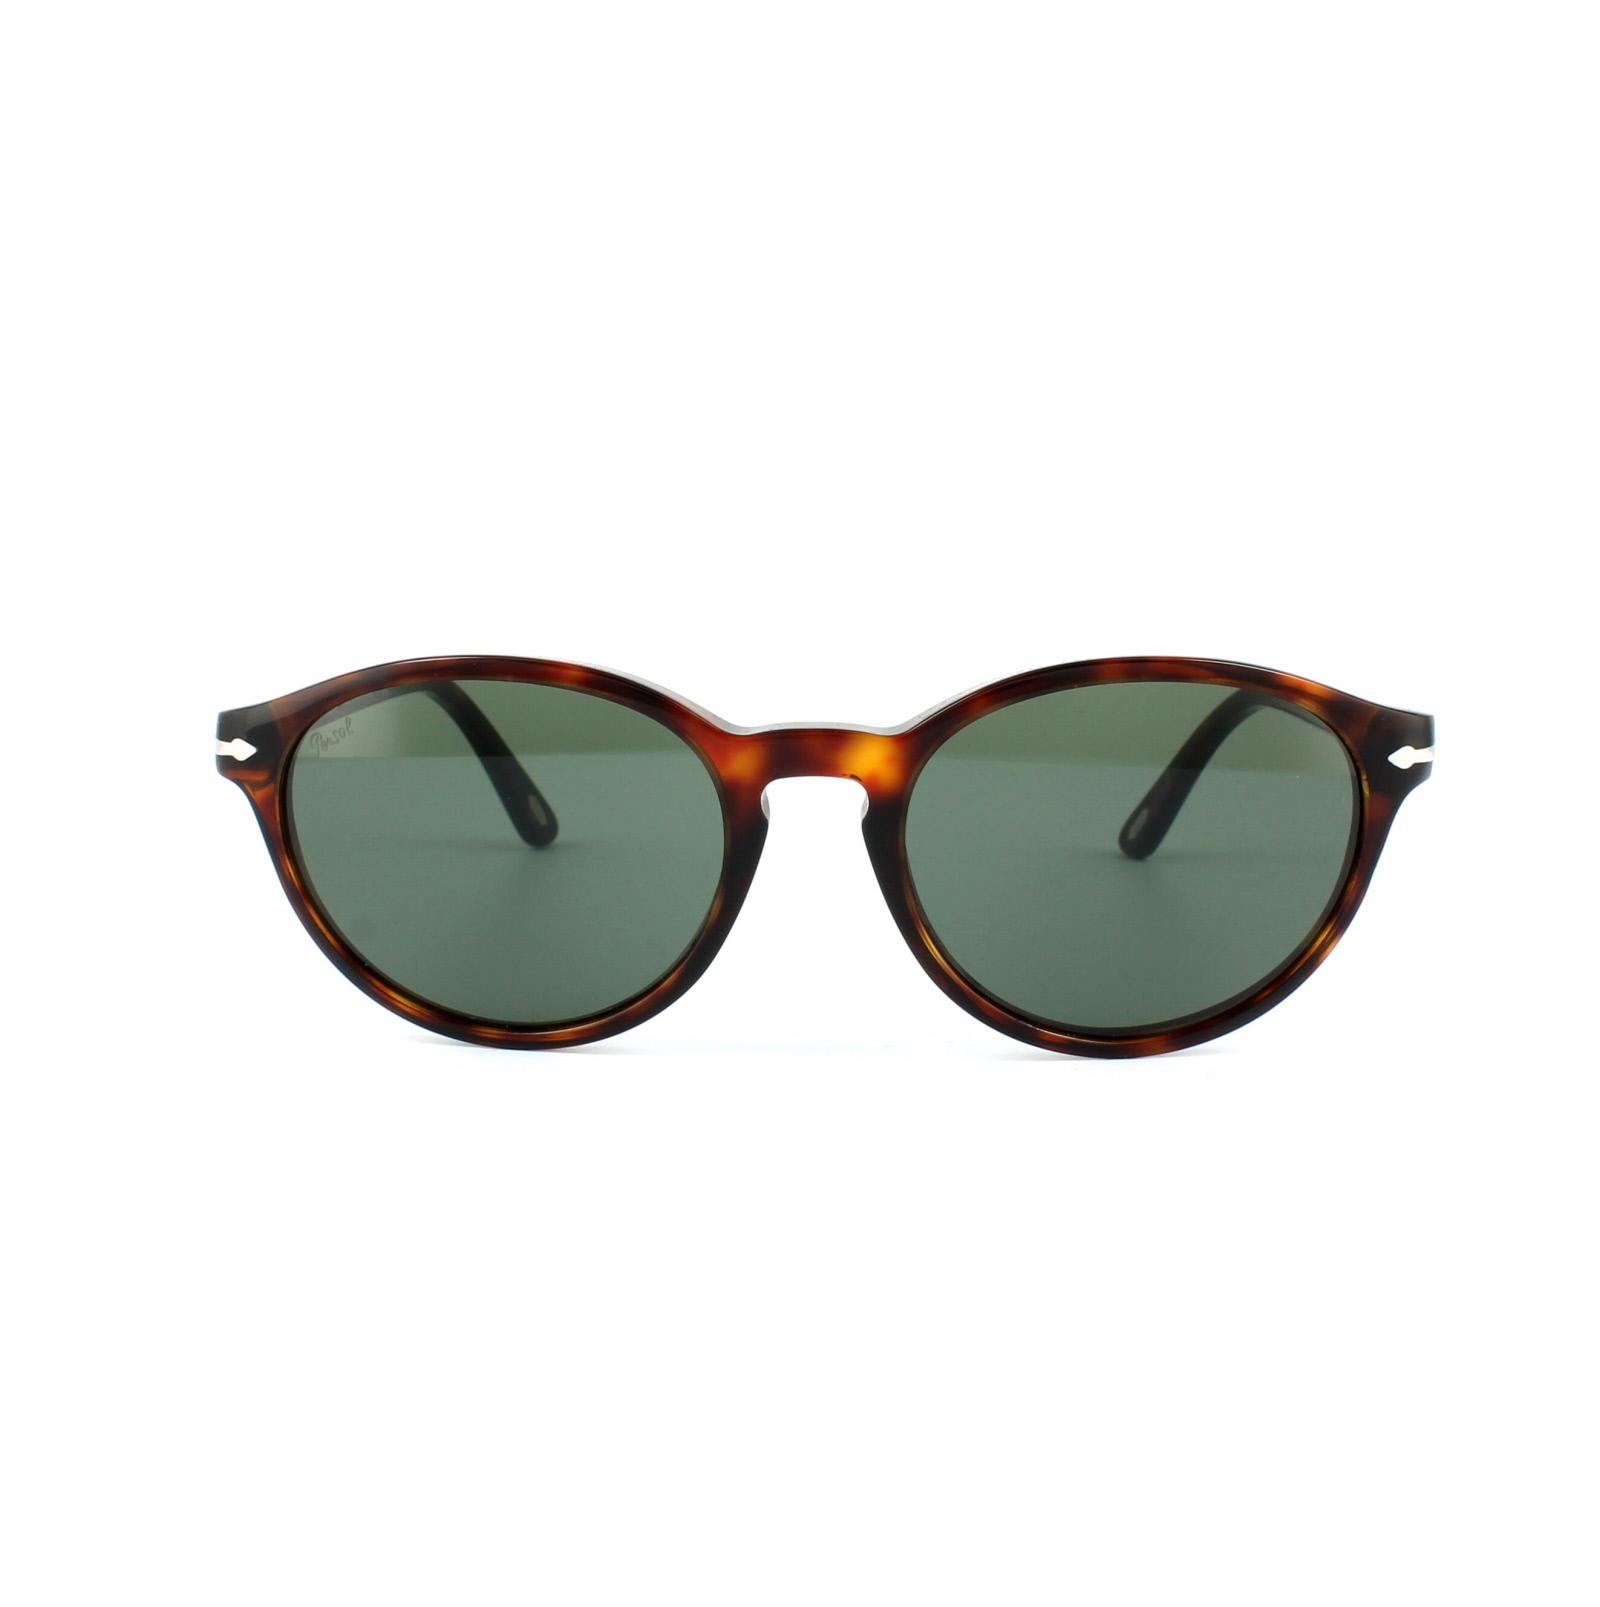 a3b2d6e5a55f Persol Sunglasses Uk Cheap